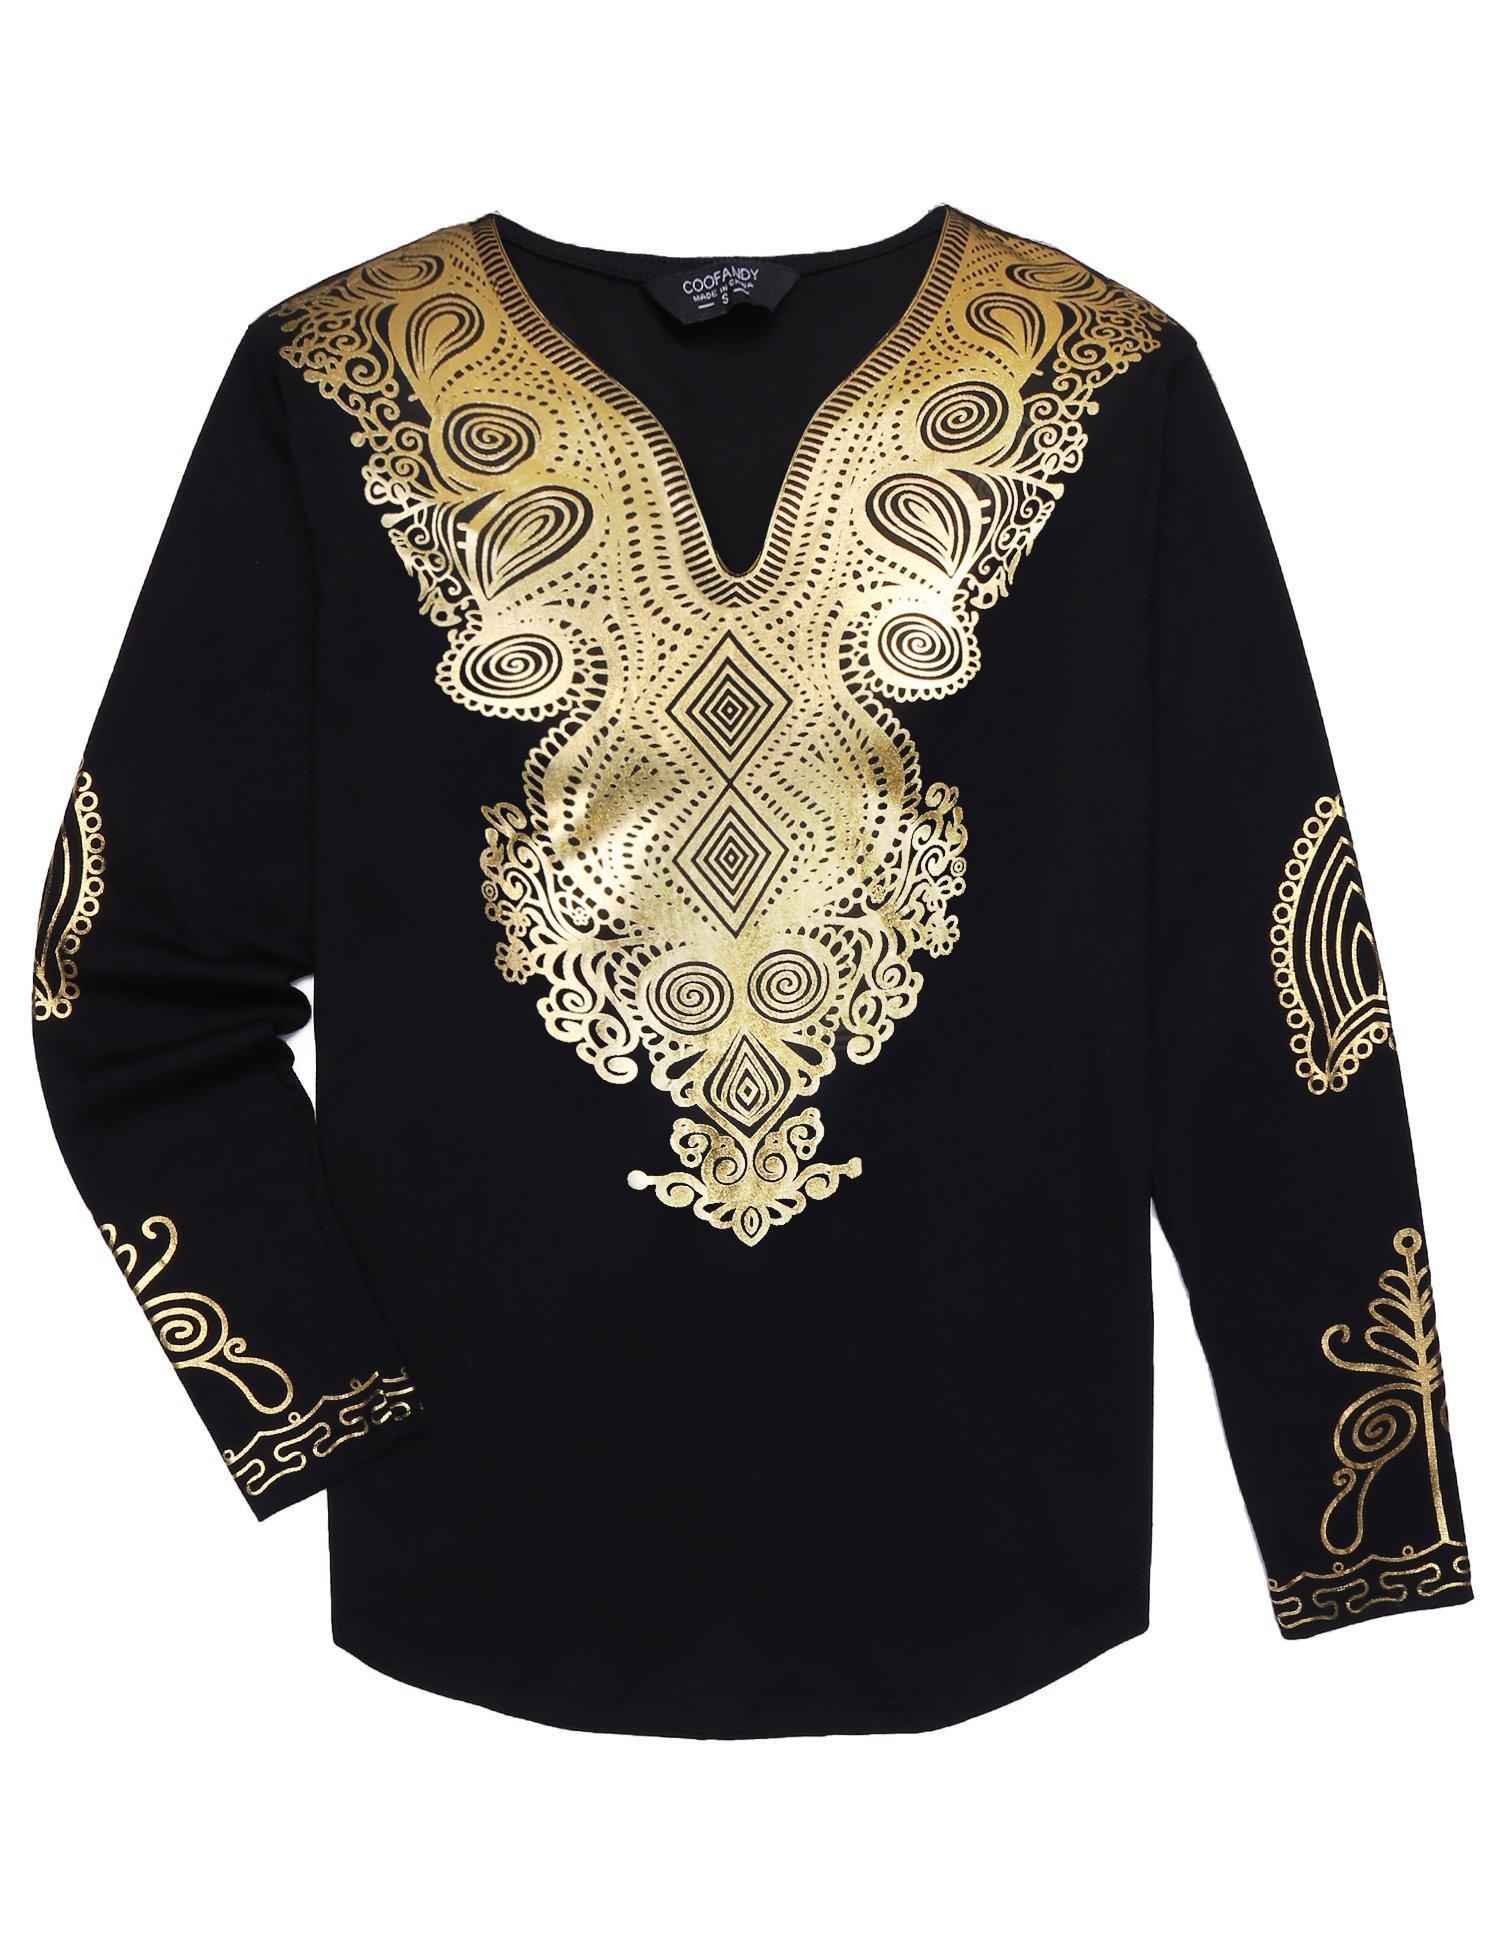 COOFANDY Men's African Print Dashiki T-Shirt Metallic Floral Tribal Festival Tops, Pat3, X-Large